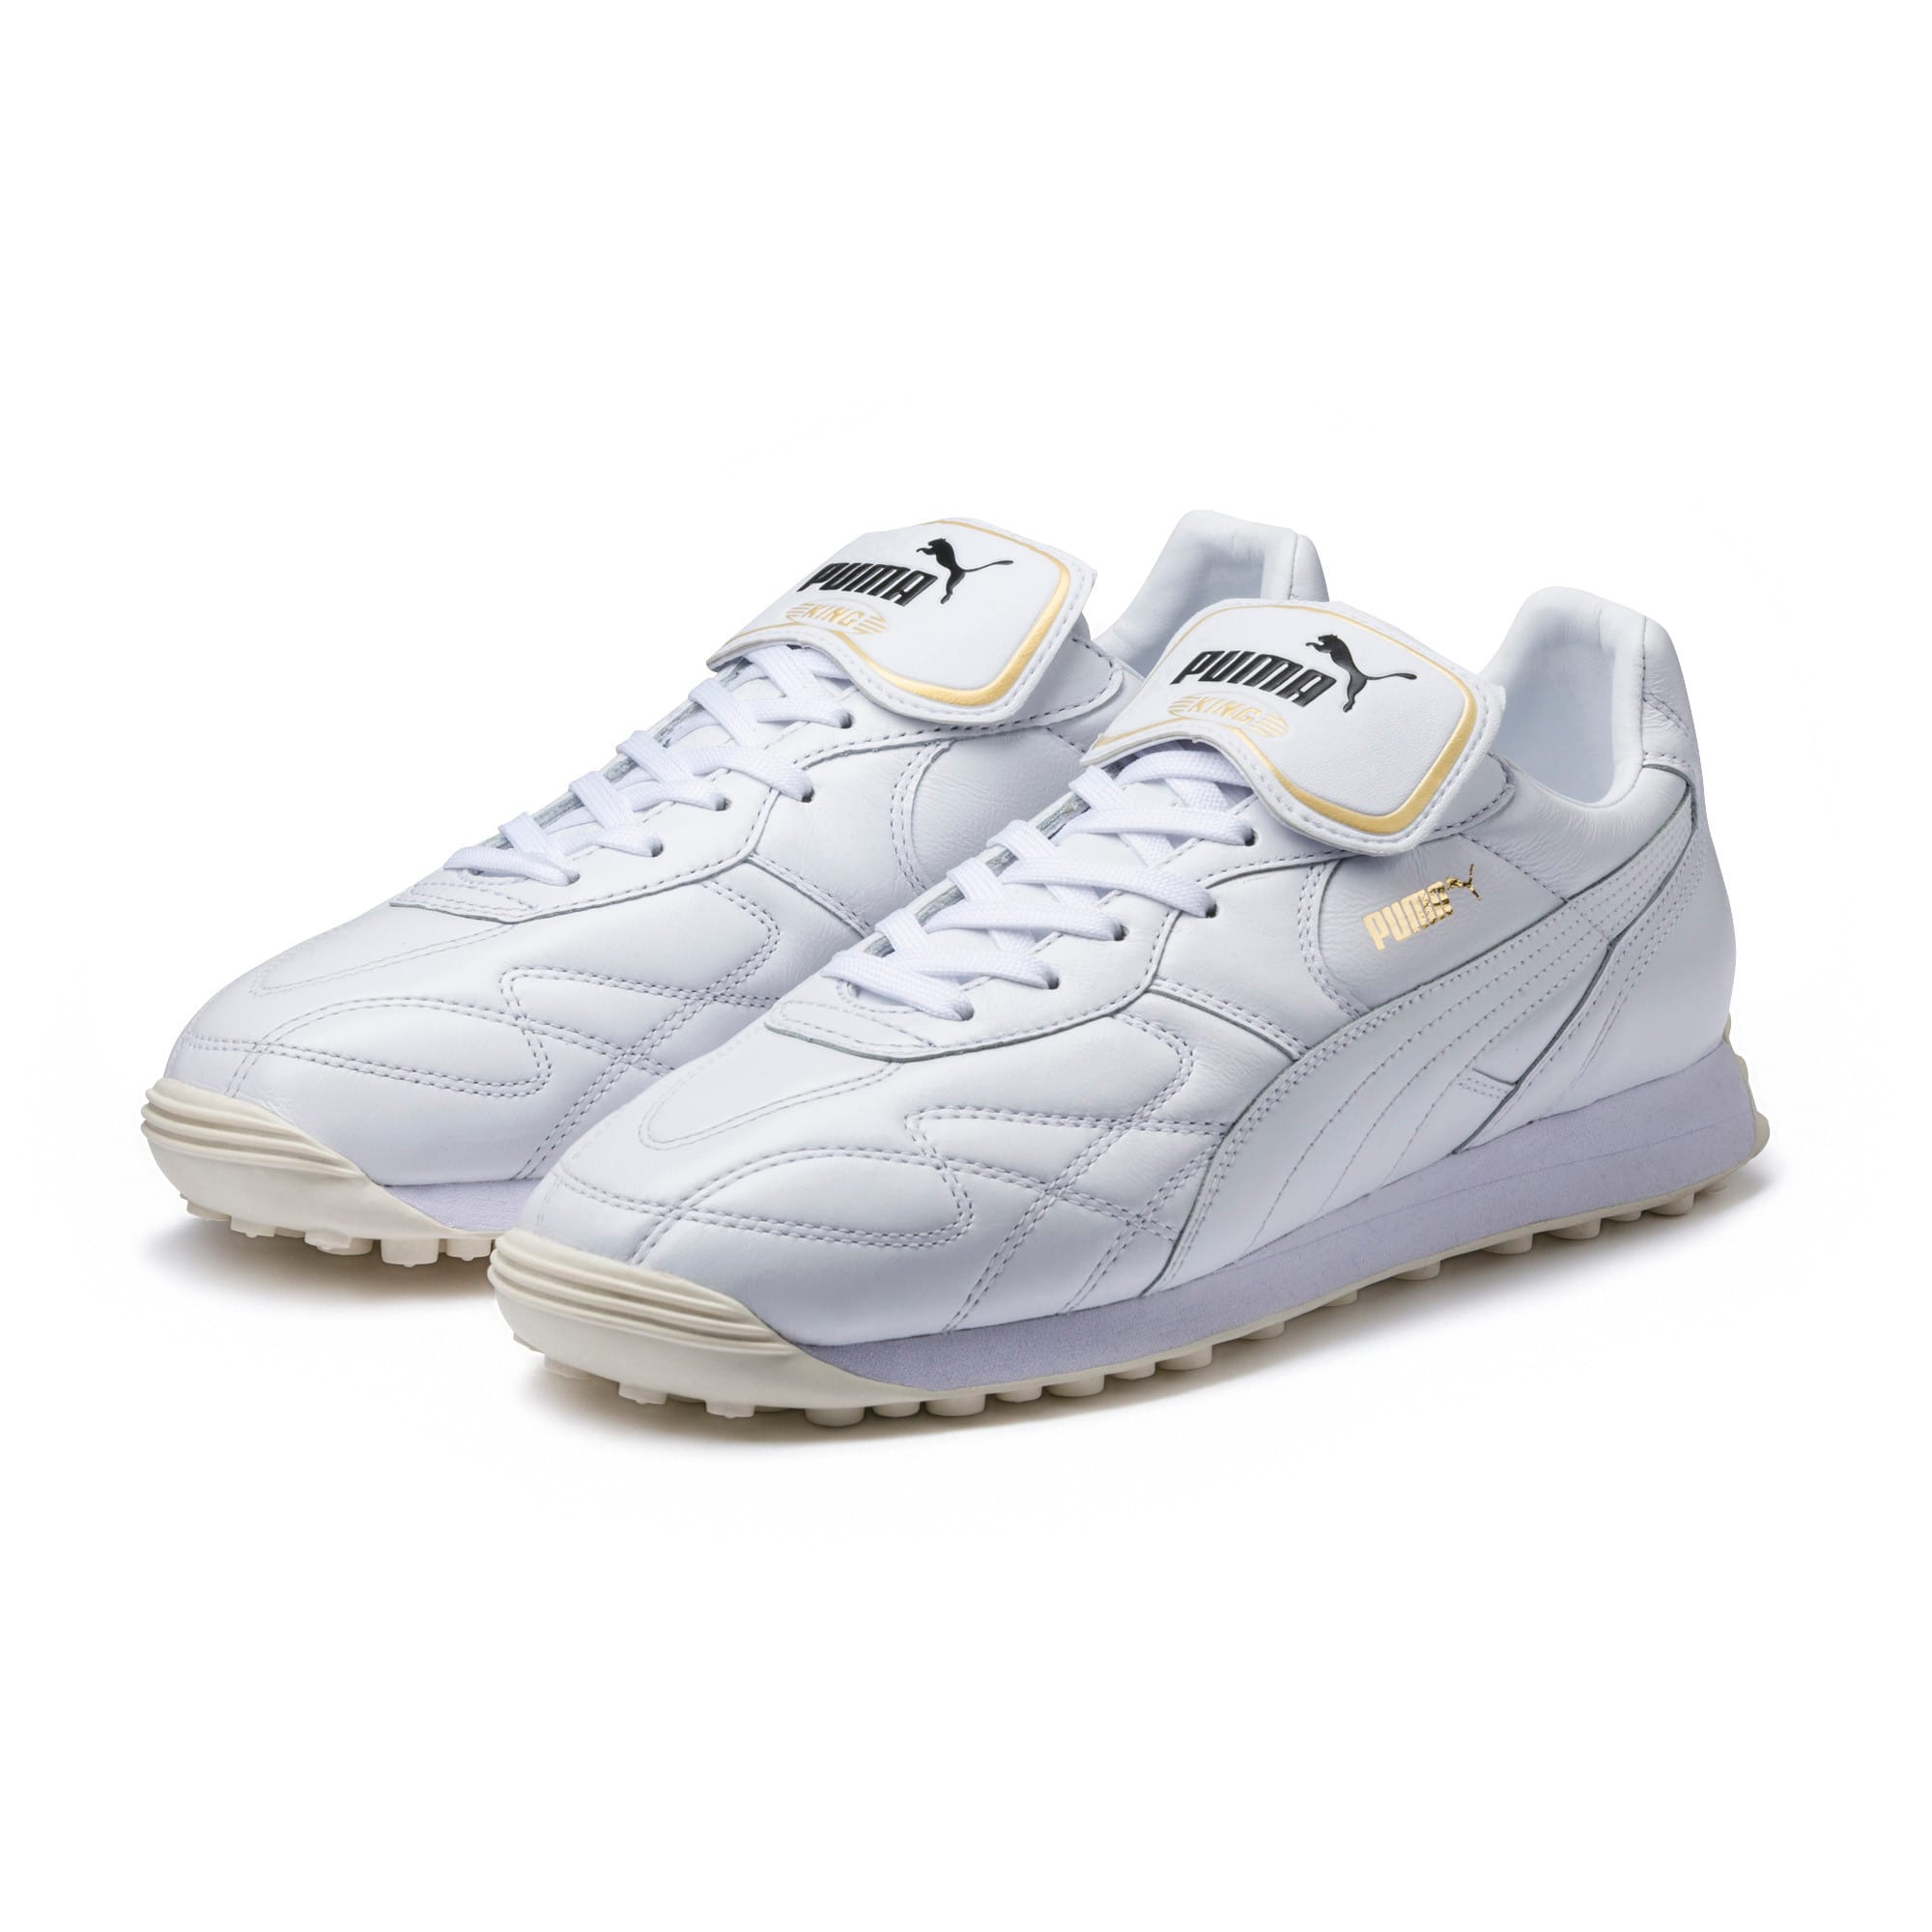 Thumbnail 2 of King Avanti Premium Sneakers, Puma White-Puma Team, medium